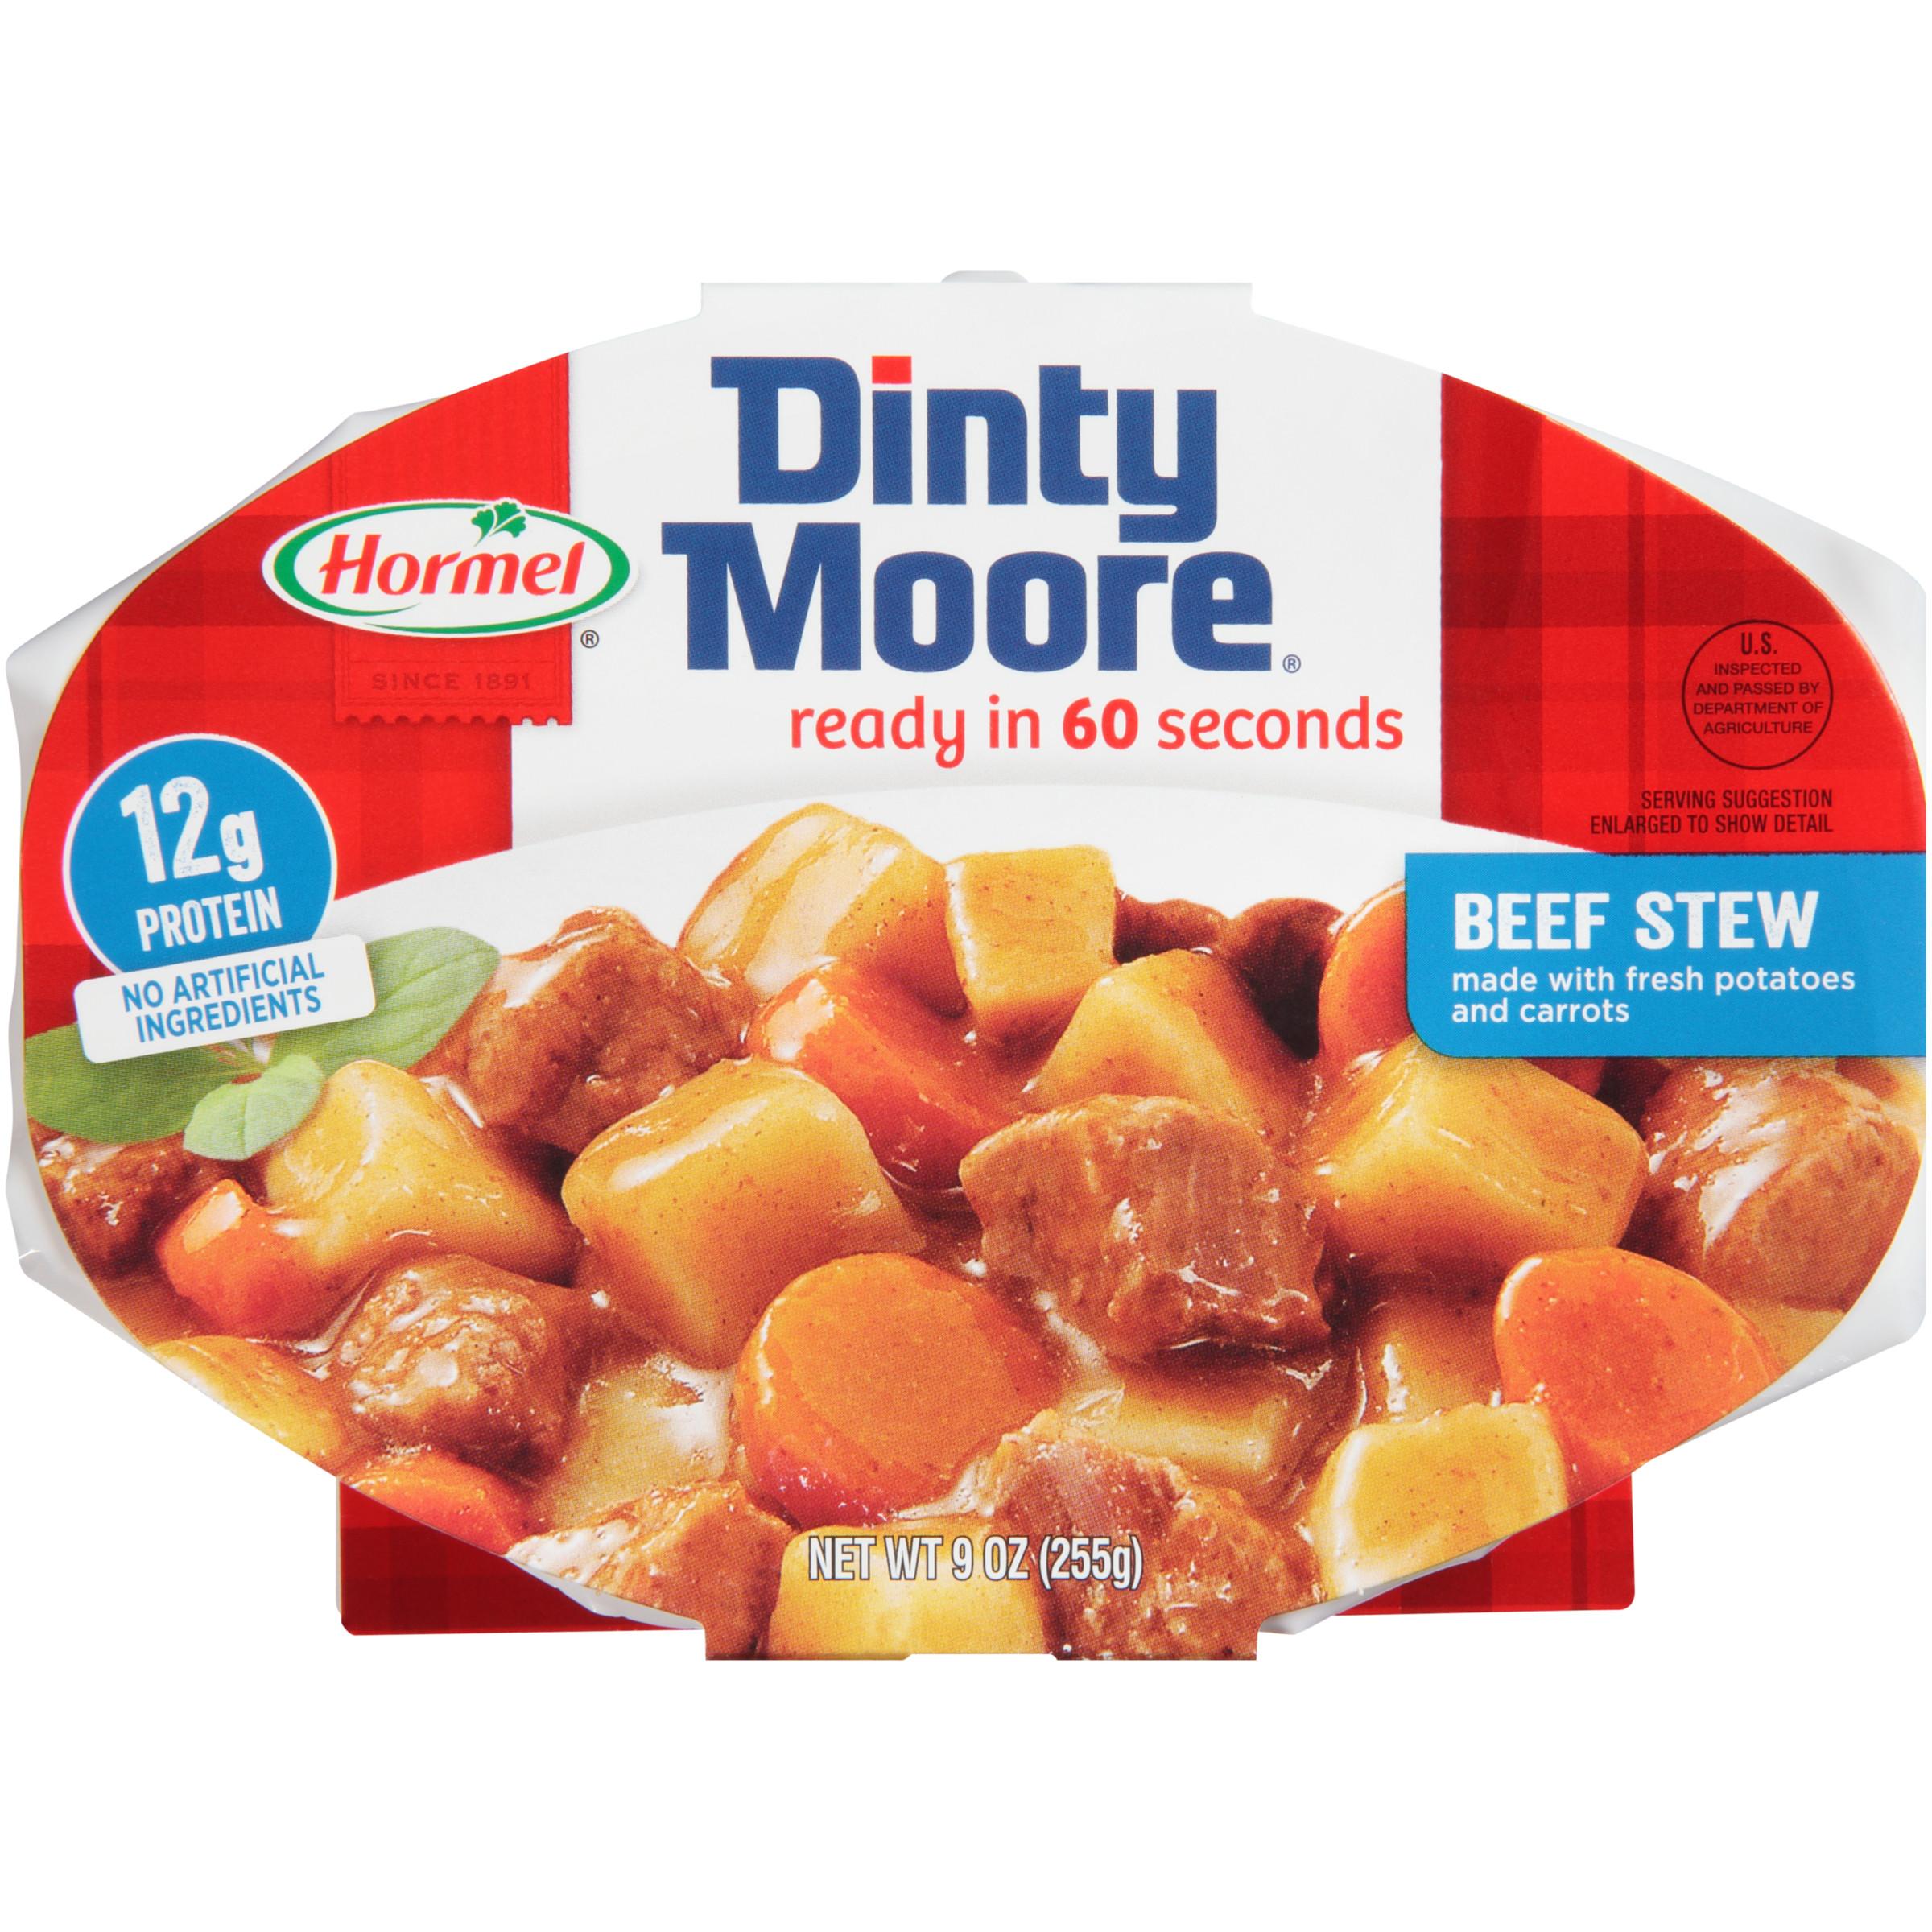 Dinty Moore Beef Stew Recipe  Dinty Moore Beef Stew 10 oz 283 g